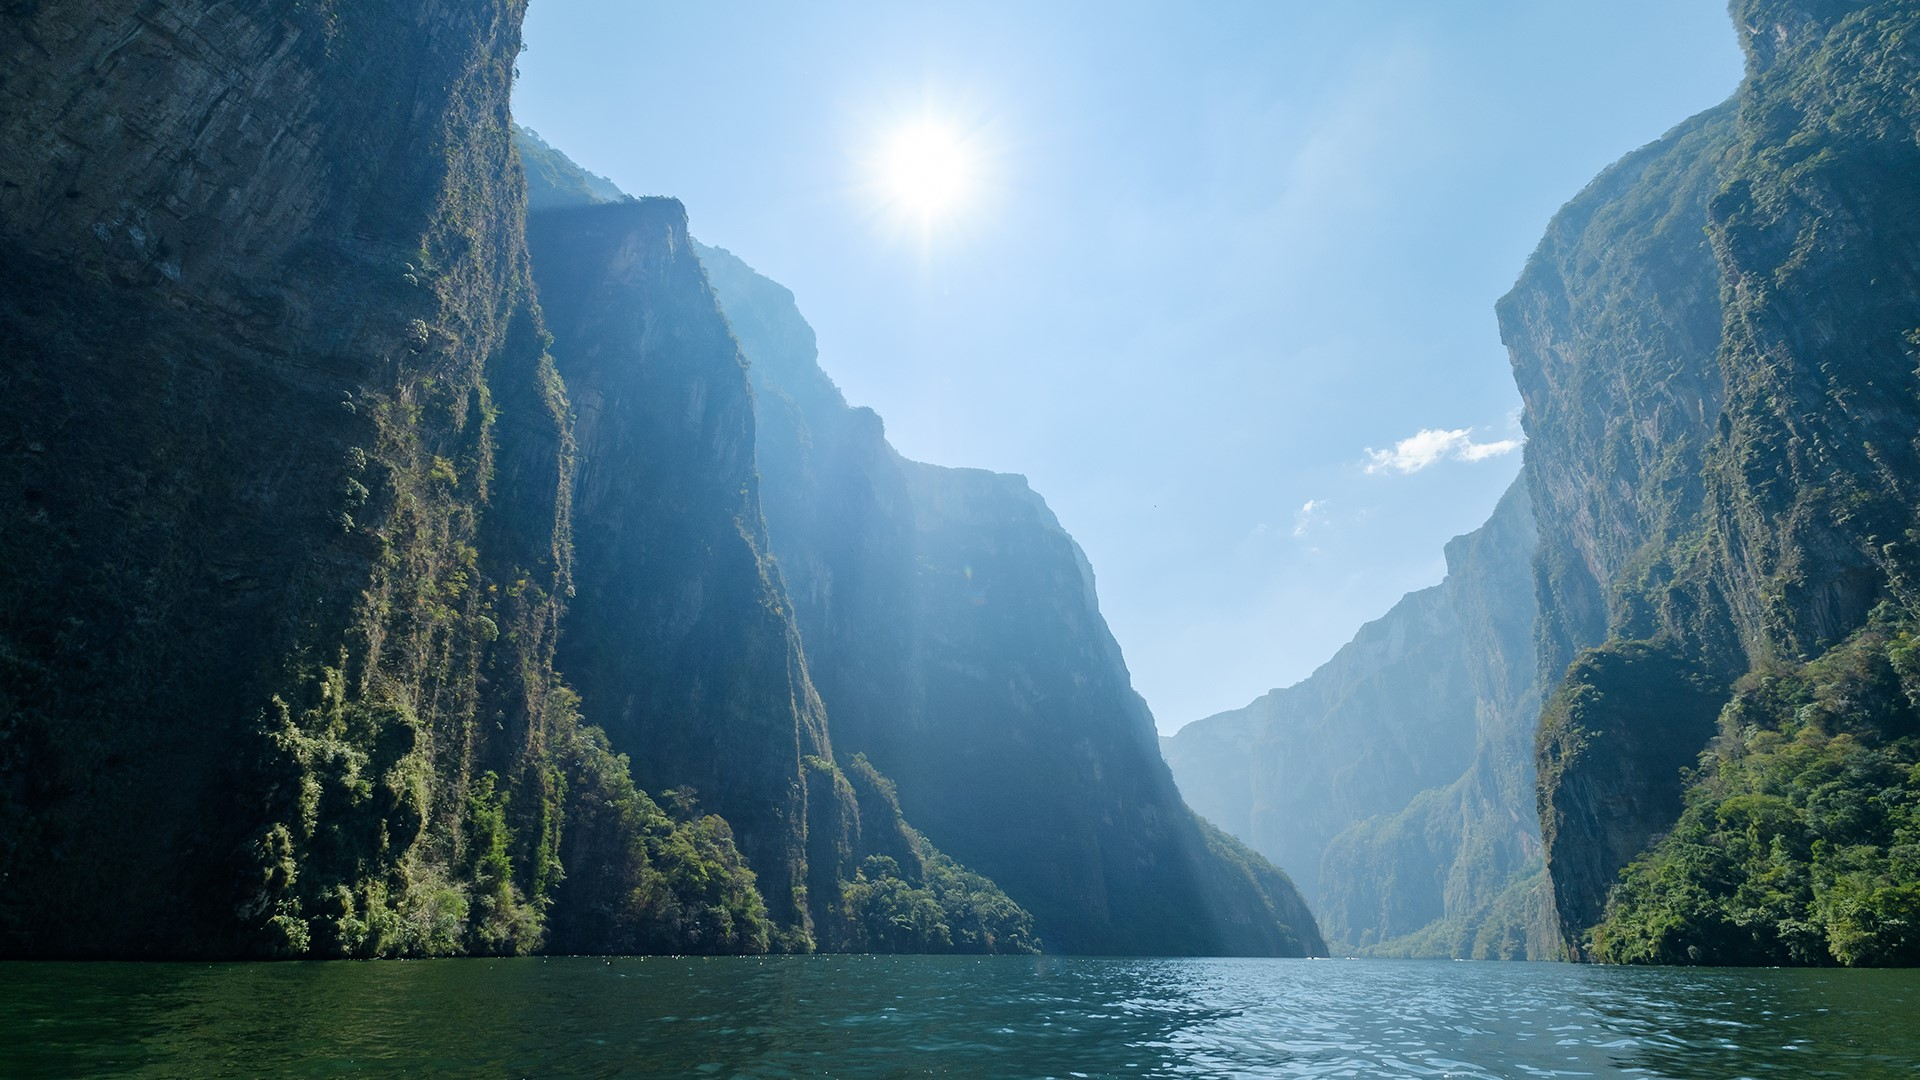 Narrow and deep Sumidero Canyon Chiapas Mexico Windows 10 1920x1080